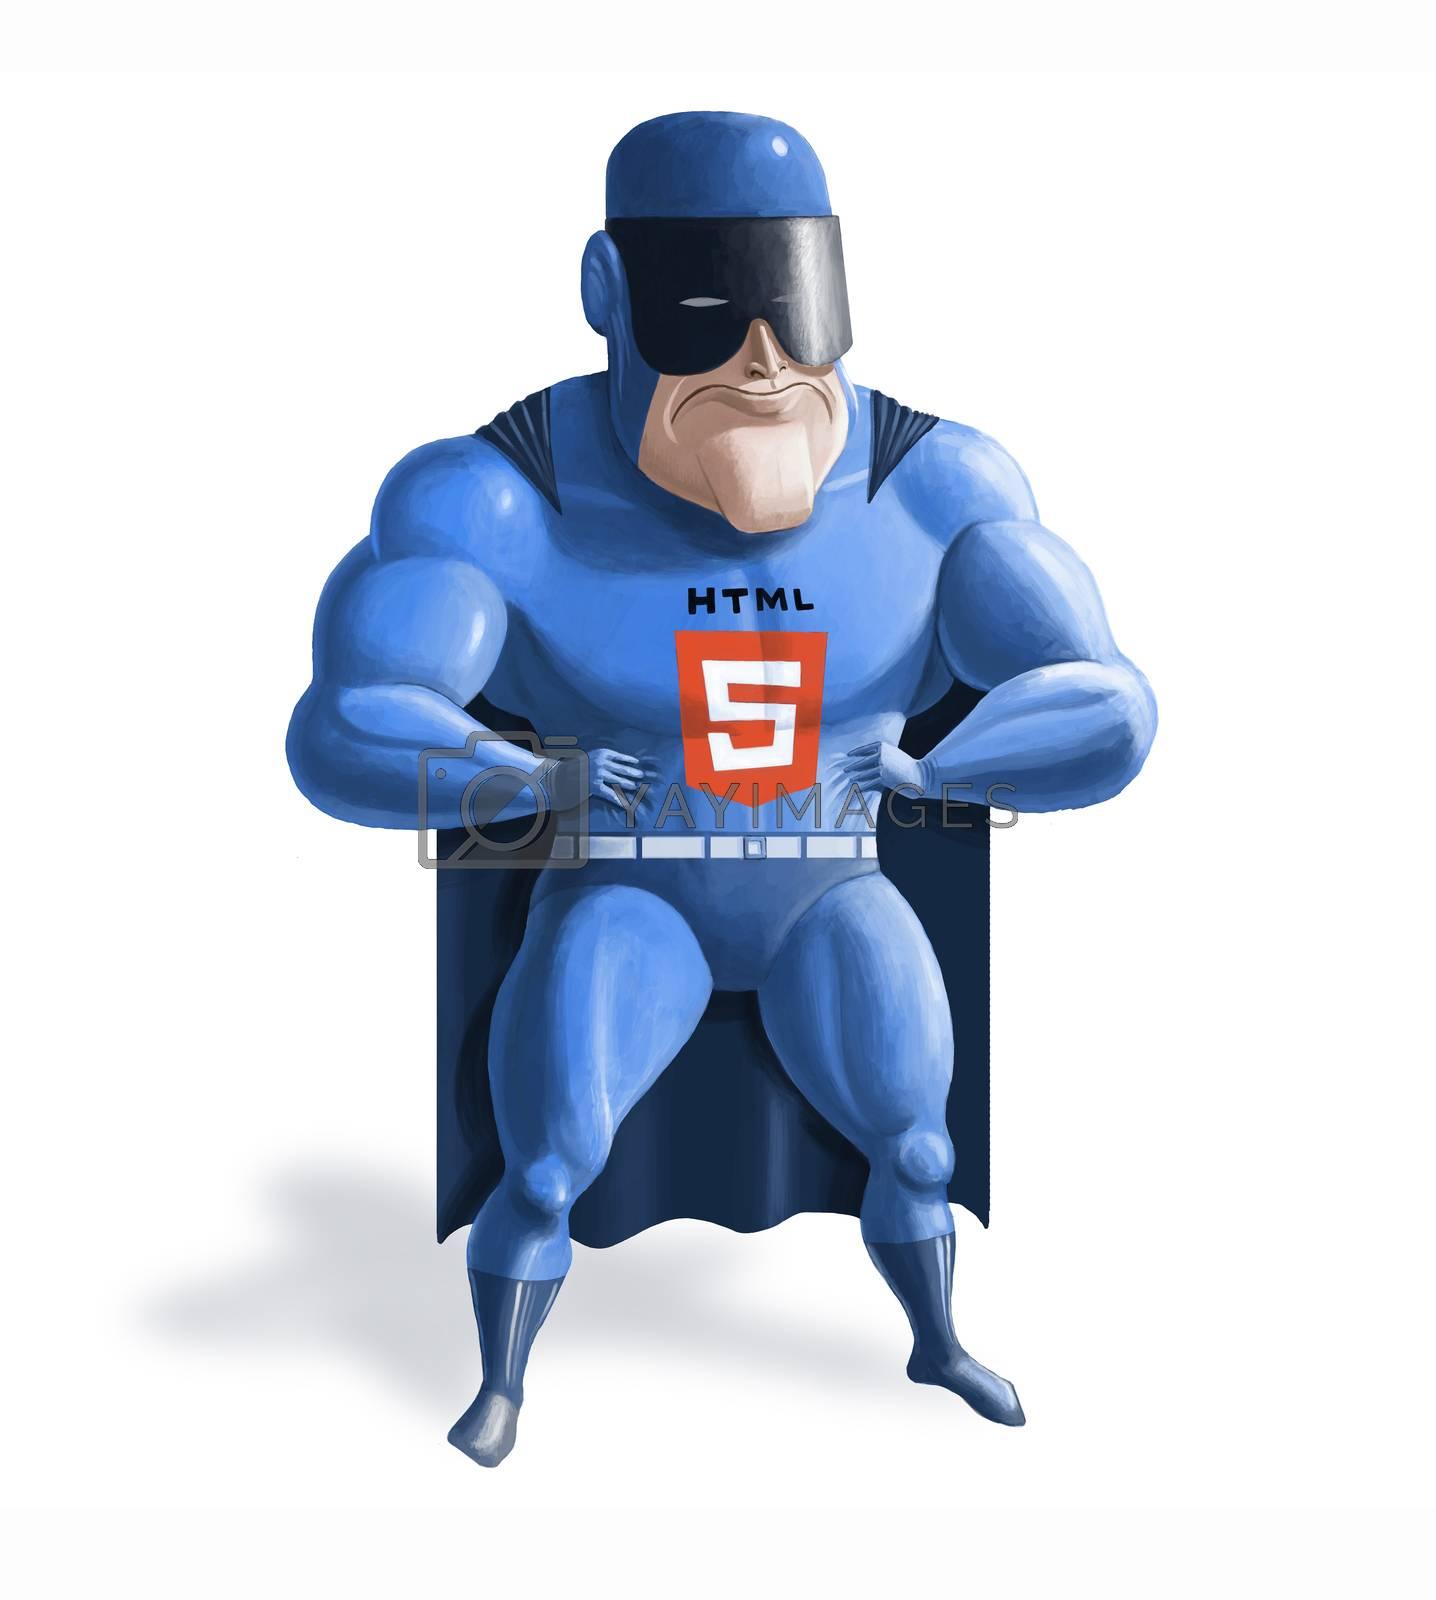 Royalty free image of HTML5 superhero by Kepush